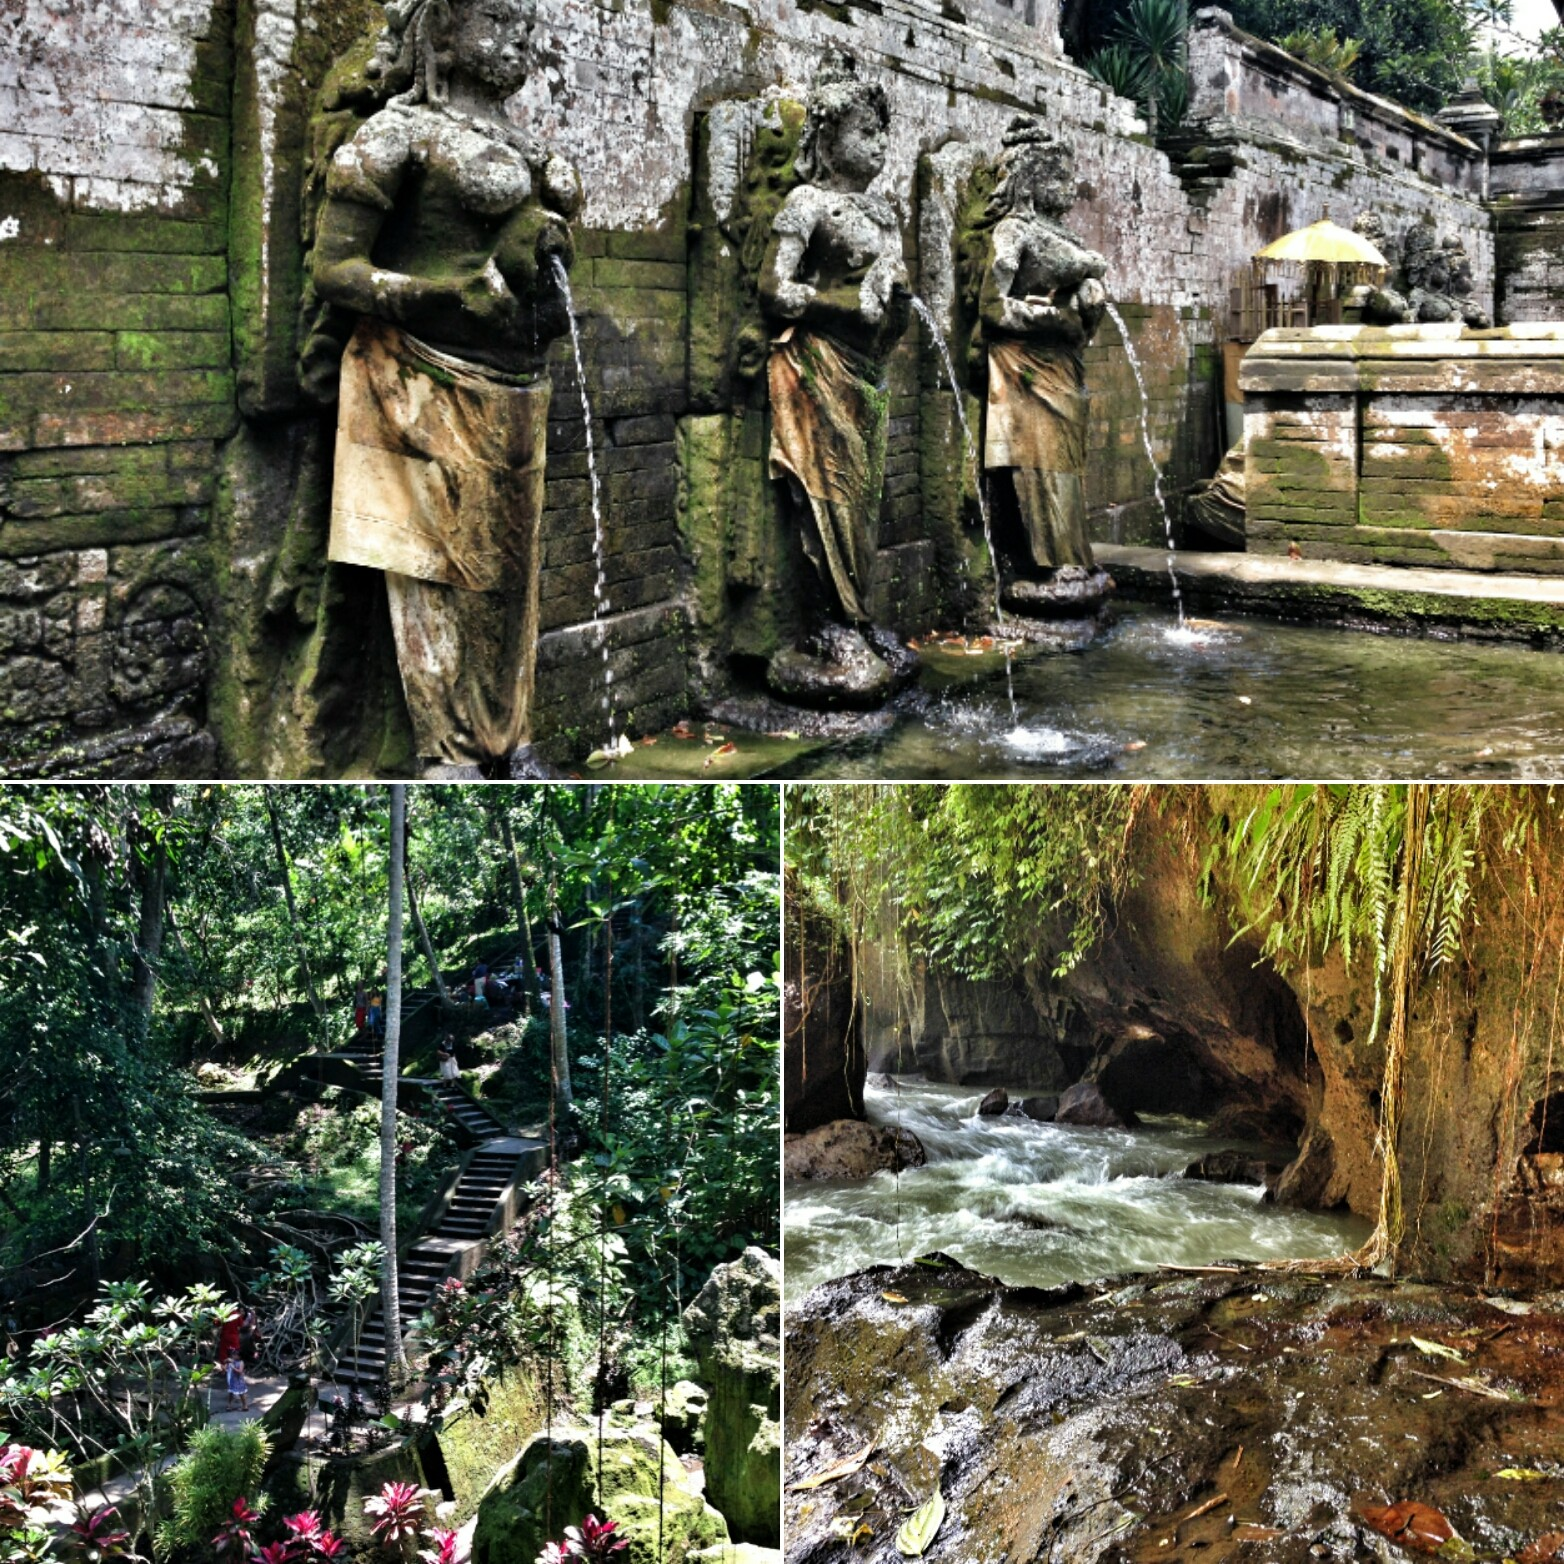 Our Bali experience in Goa Raja